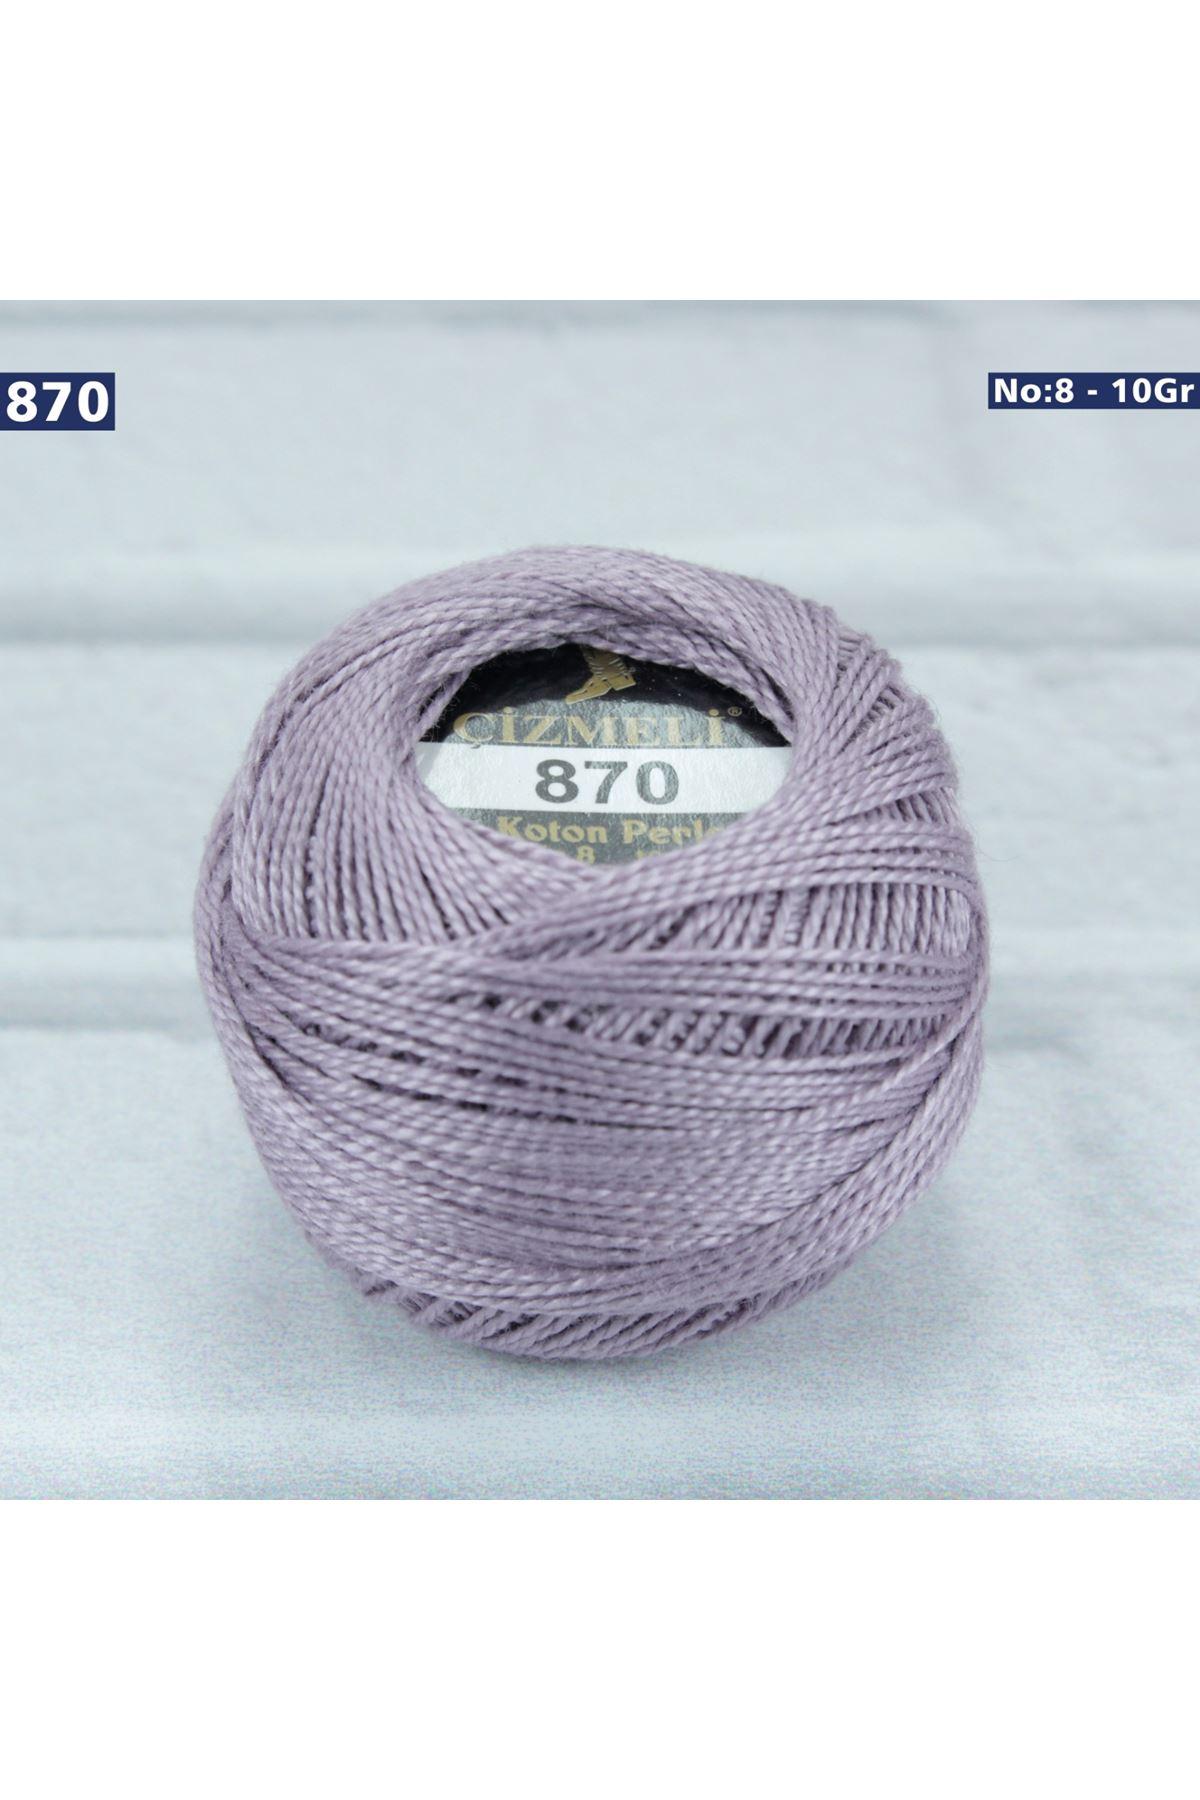 Çizmeli Cotton Perle Nakış İpliği No: 870